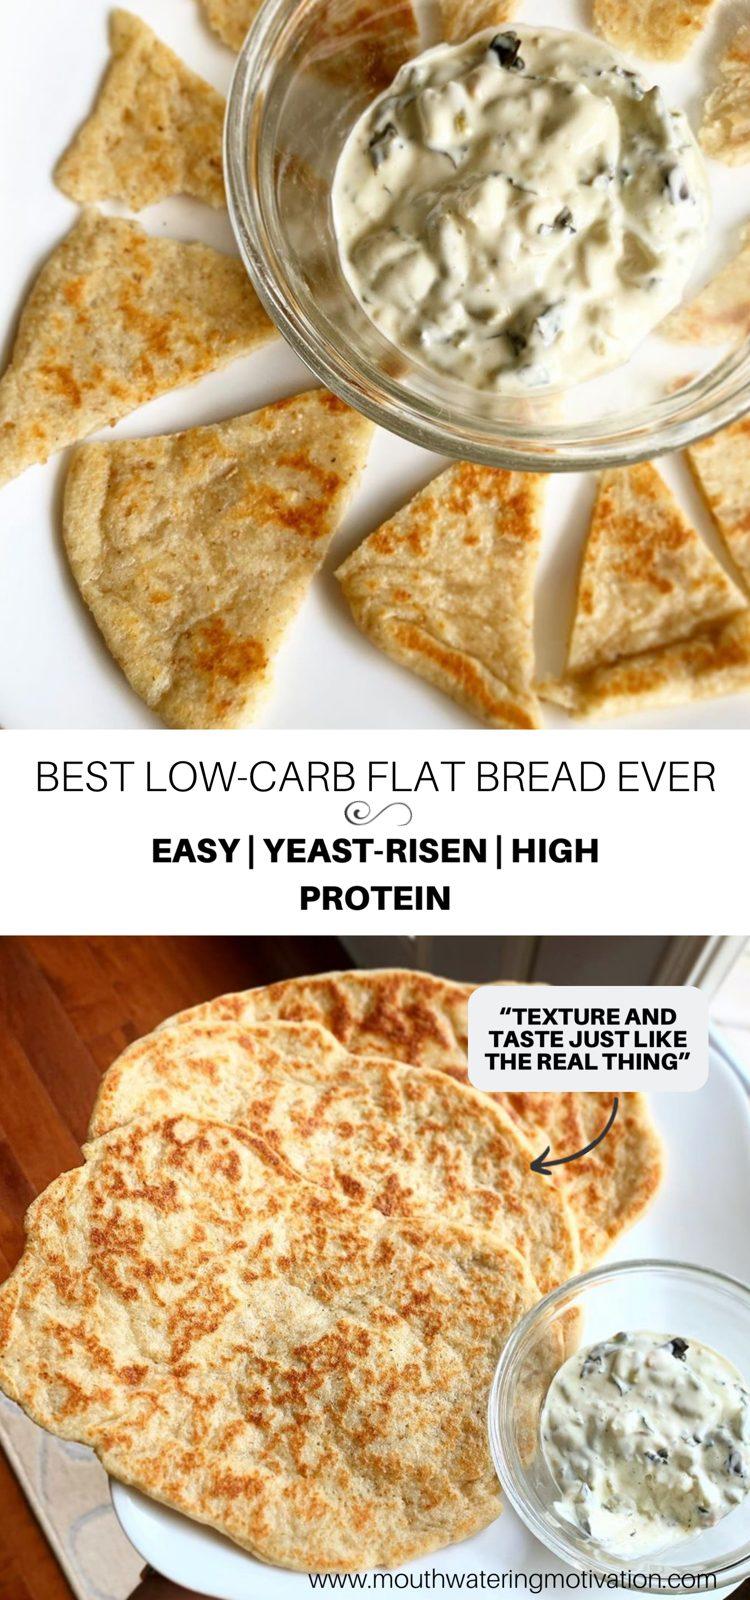 low-carb flat bread